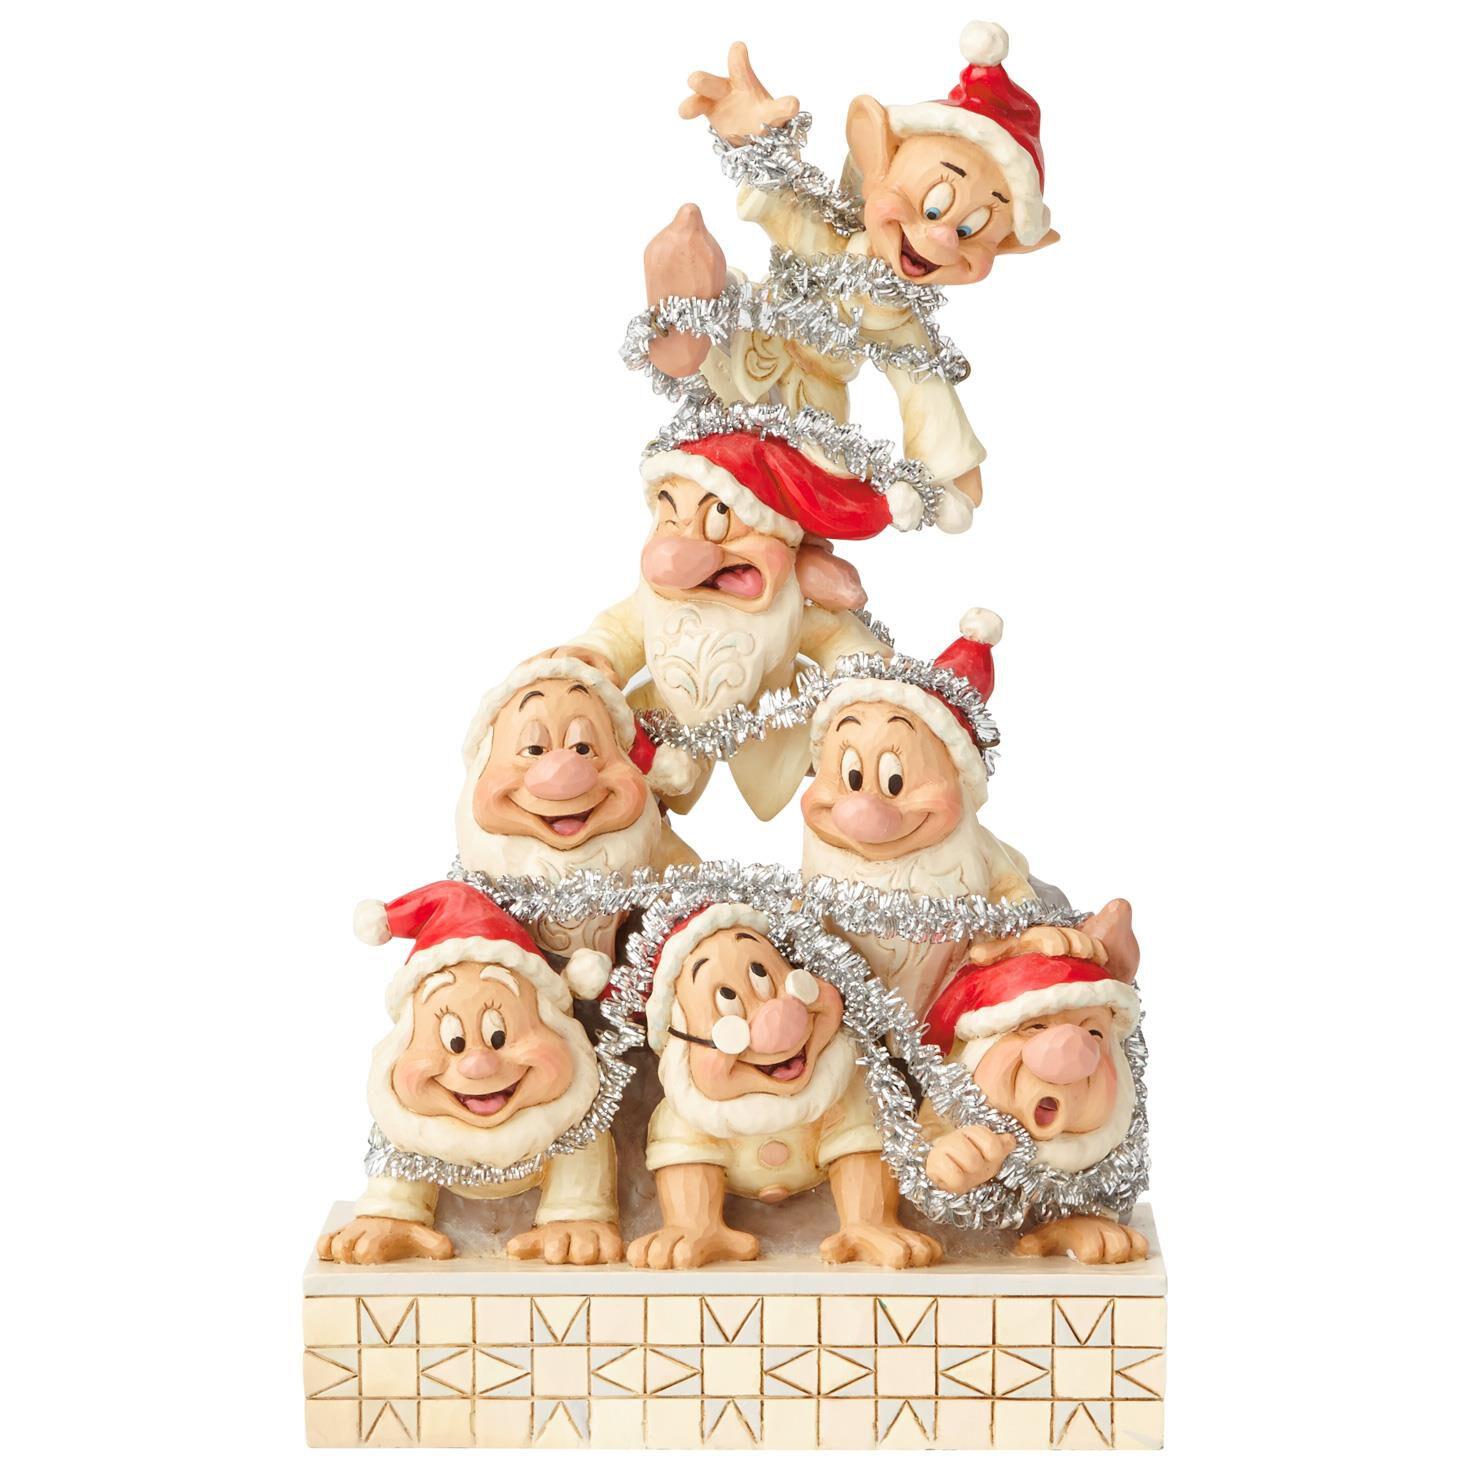 jim shore disney traditions seven dwarfs figurine 8 figurines hallmark